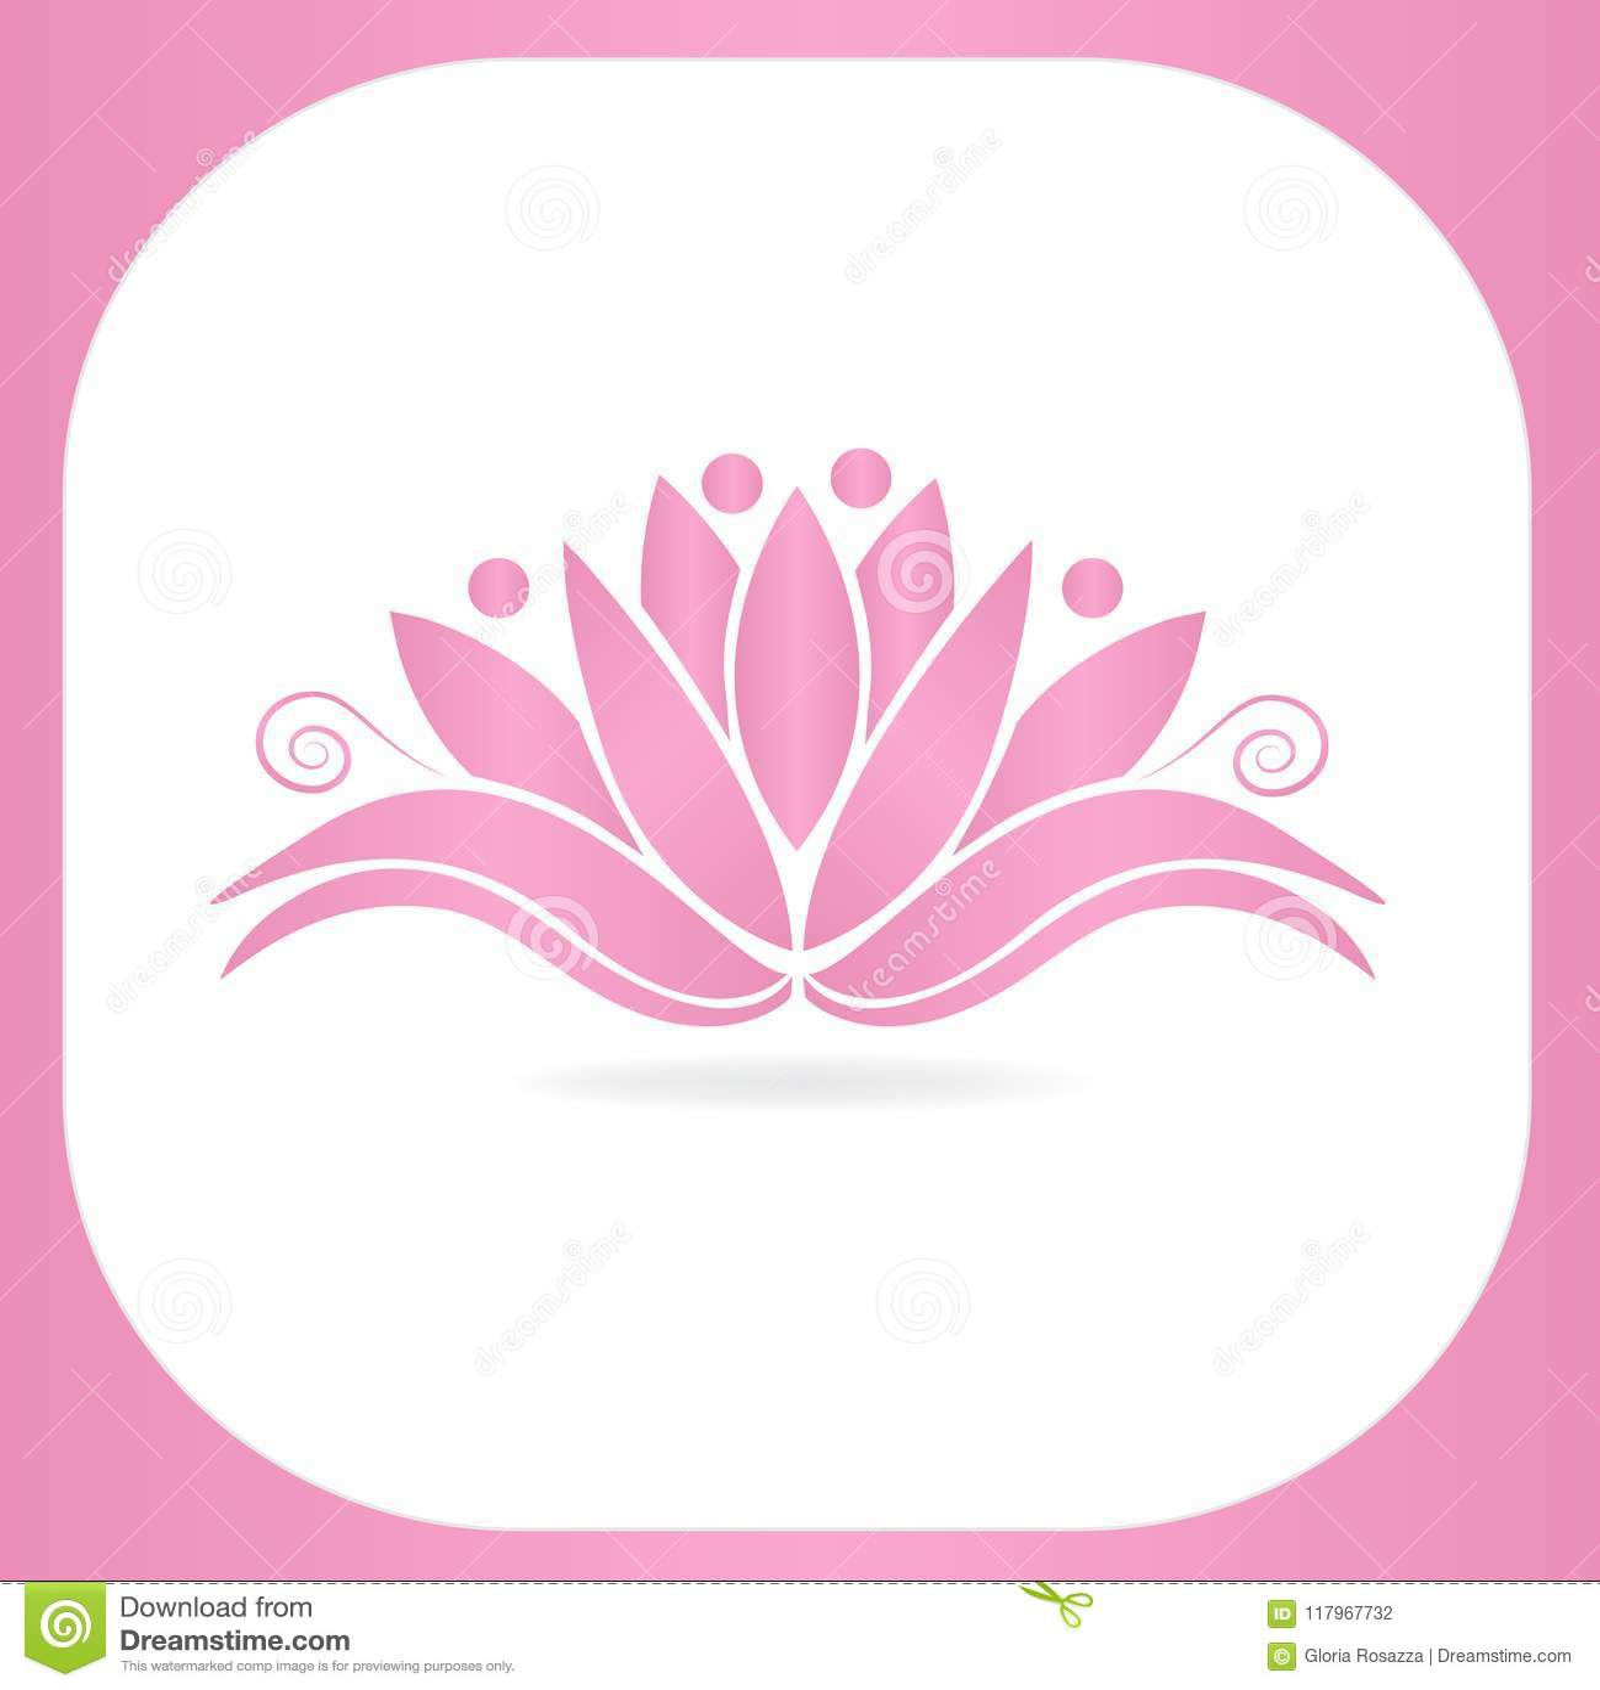 Logo Lotus Flower Yoga Teamwork Vector Image Illustration Graphic